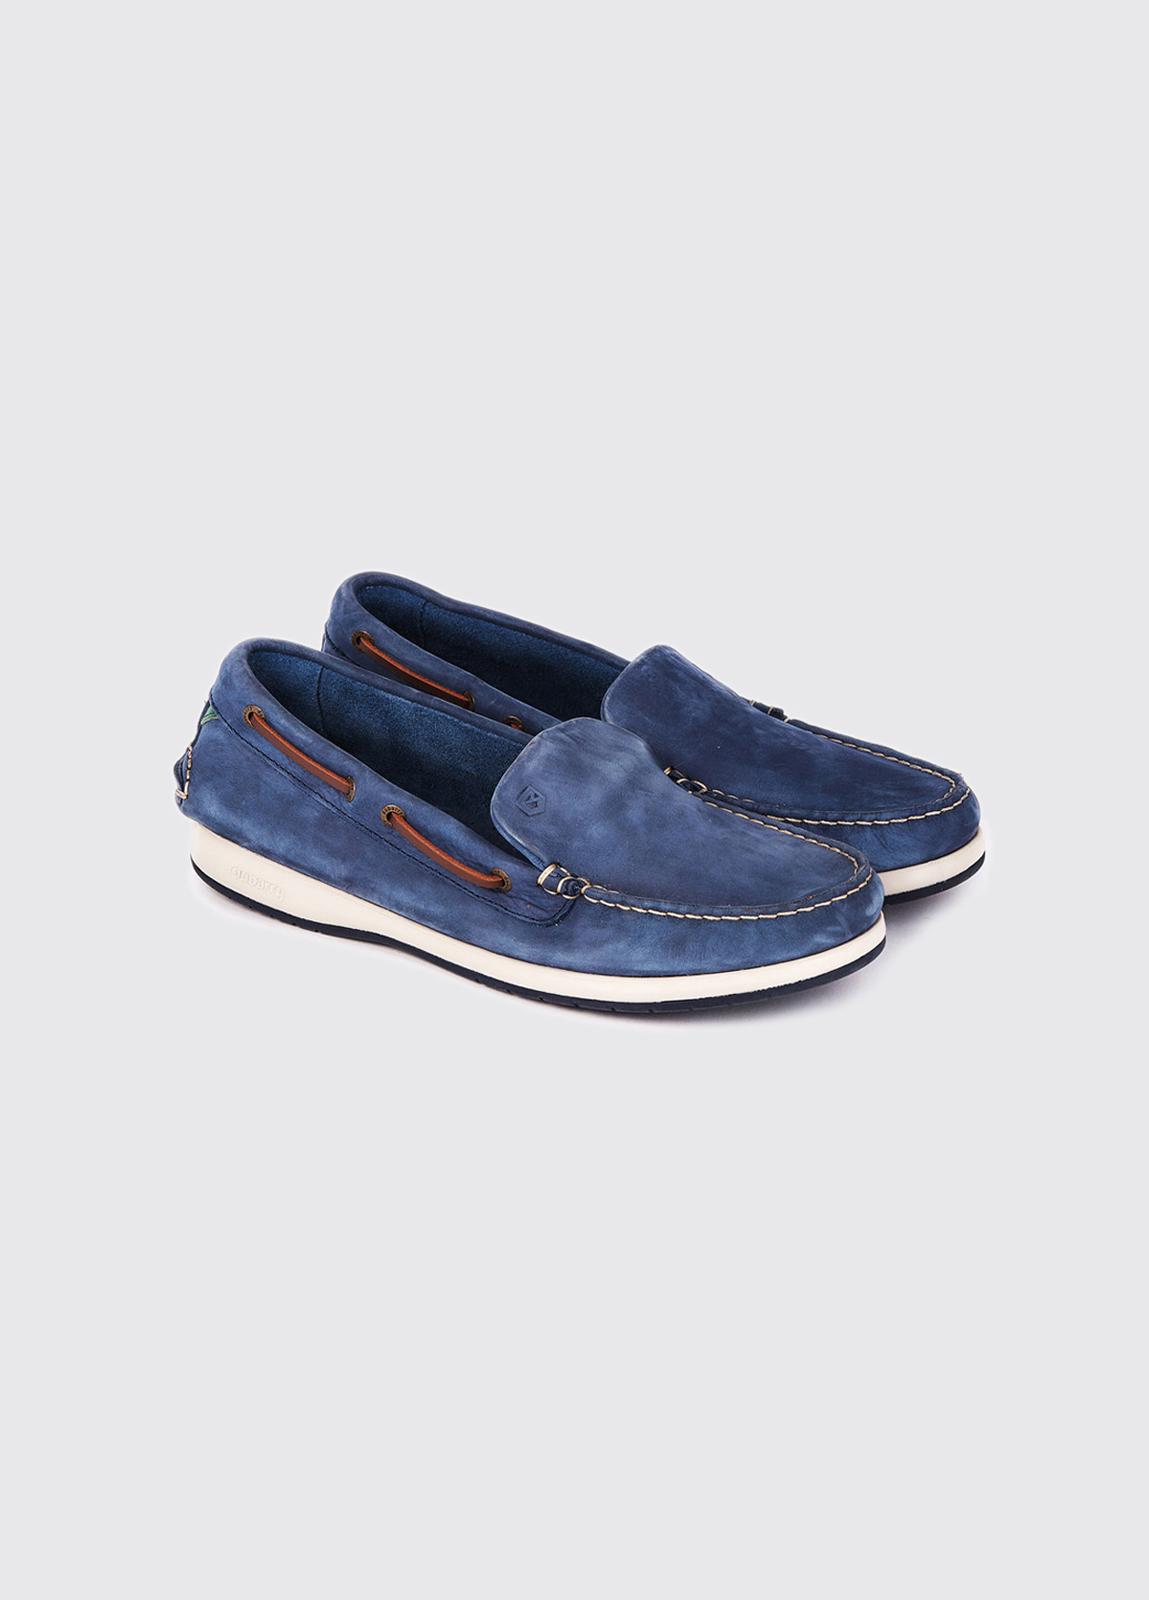 Marco XLT Deck Shoe - Denim